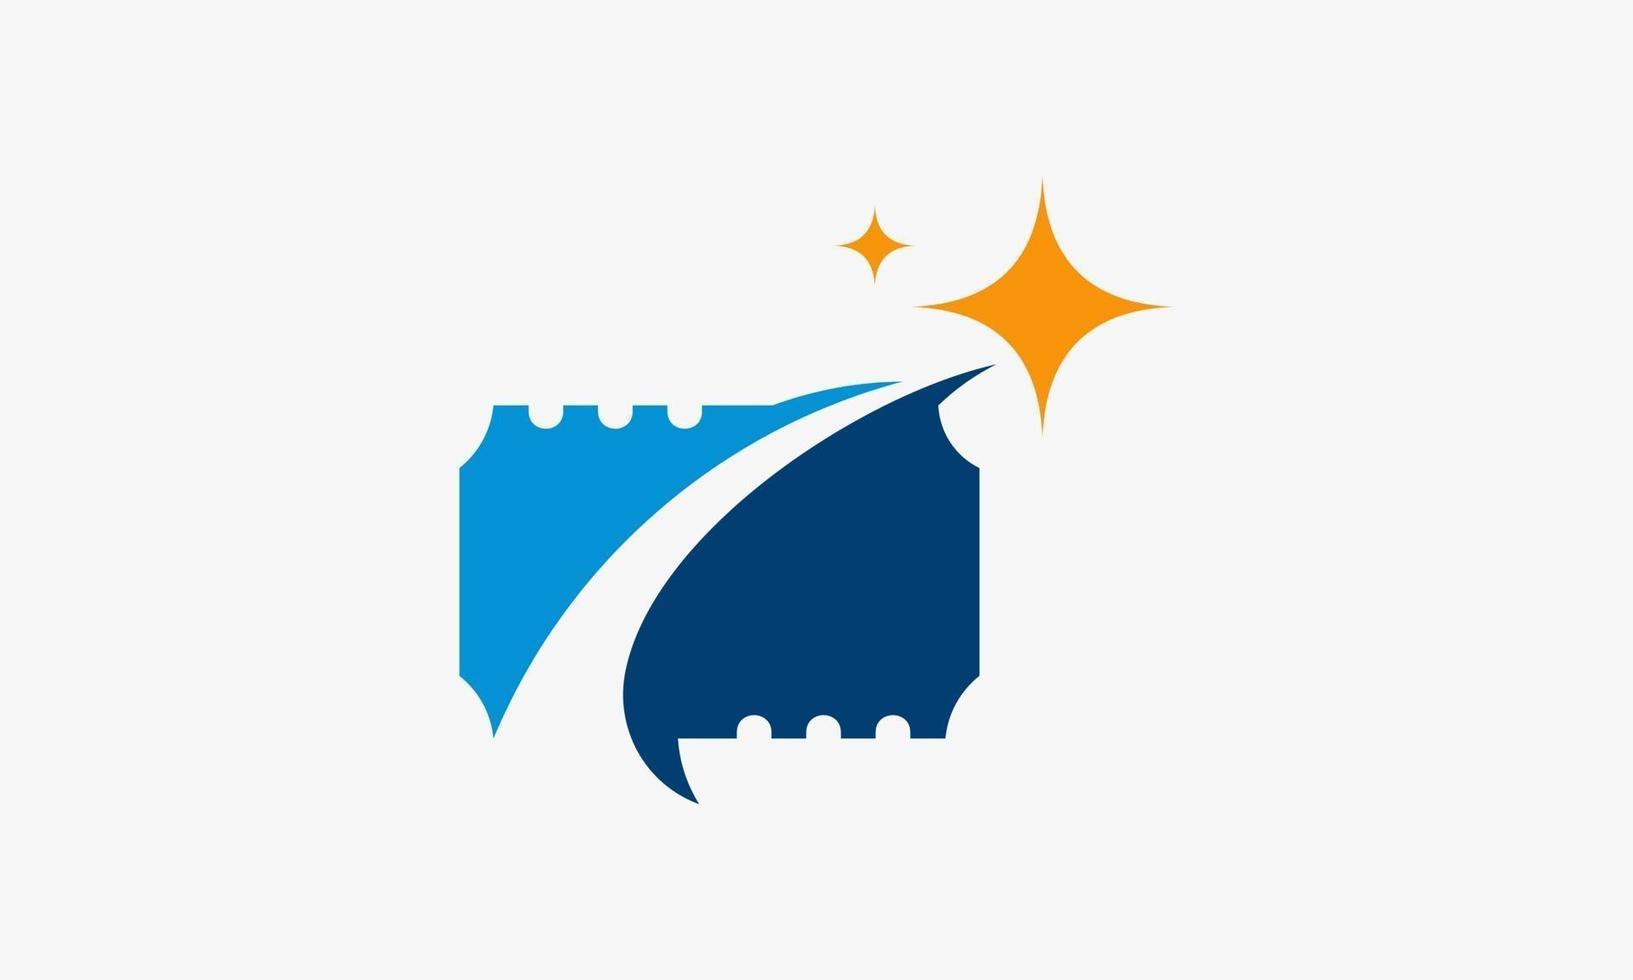 diseño de icono de boleto estrella vip vector